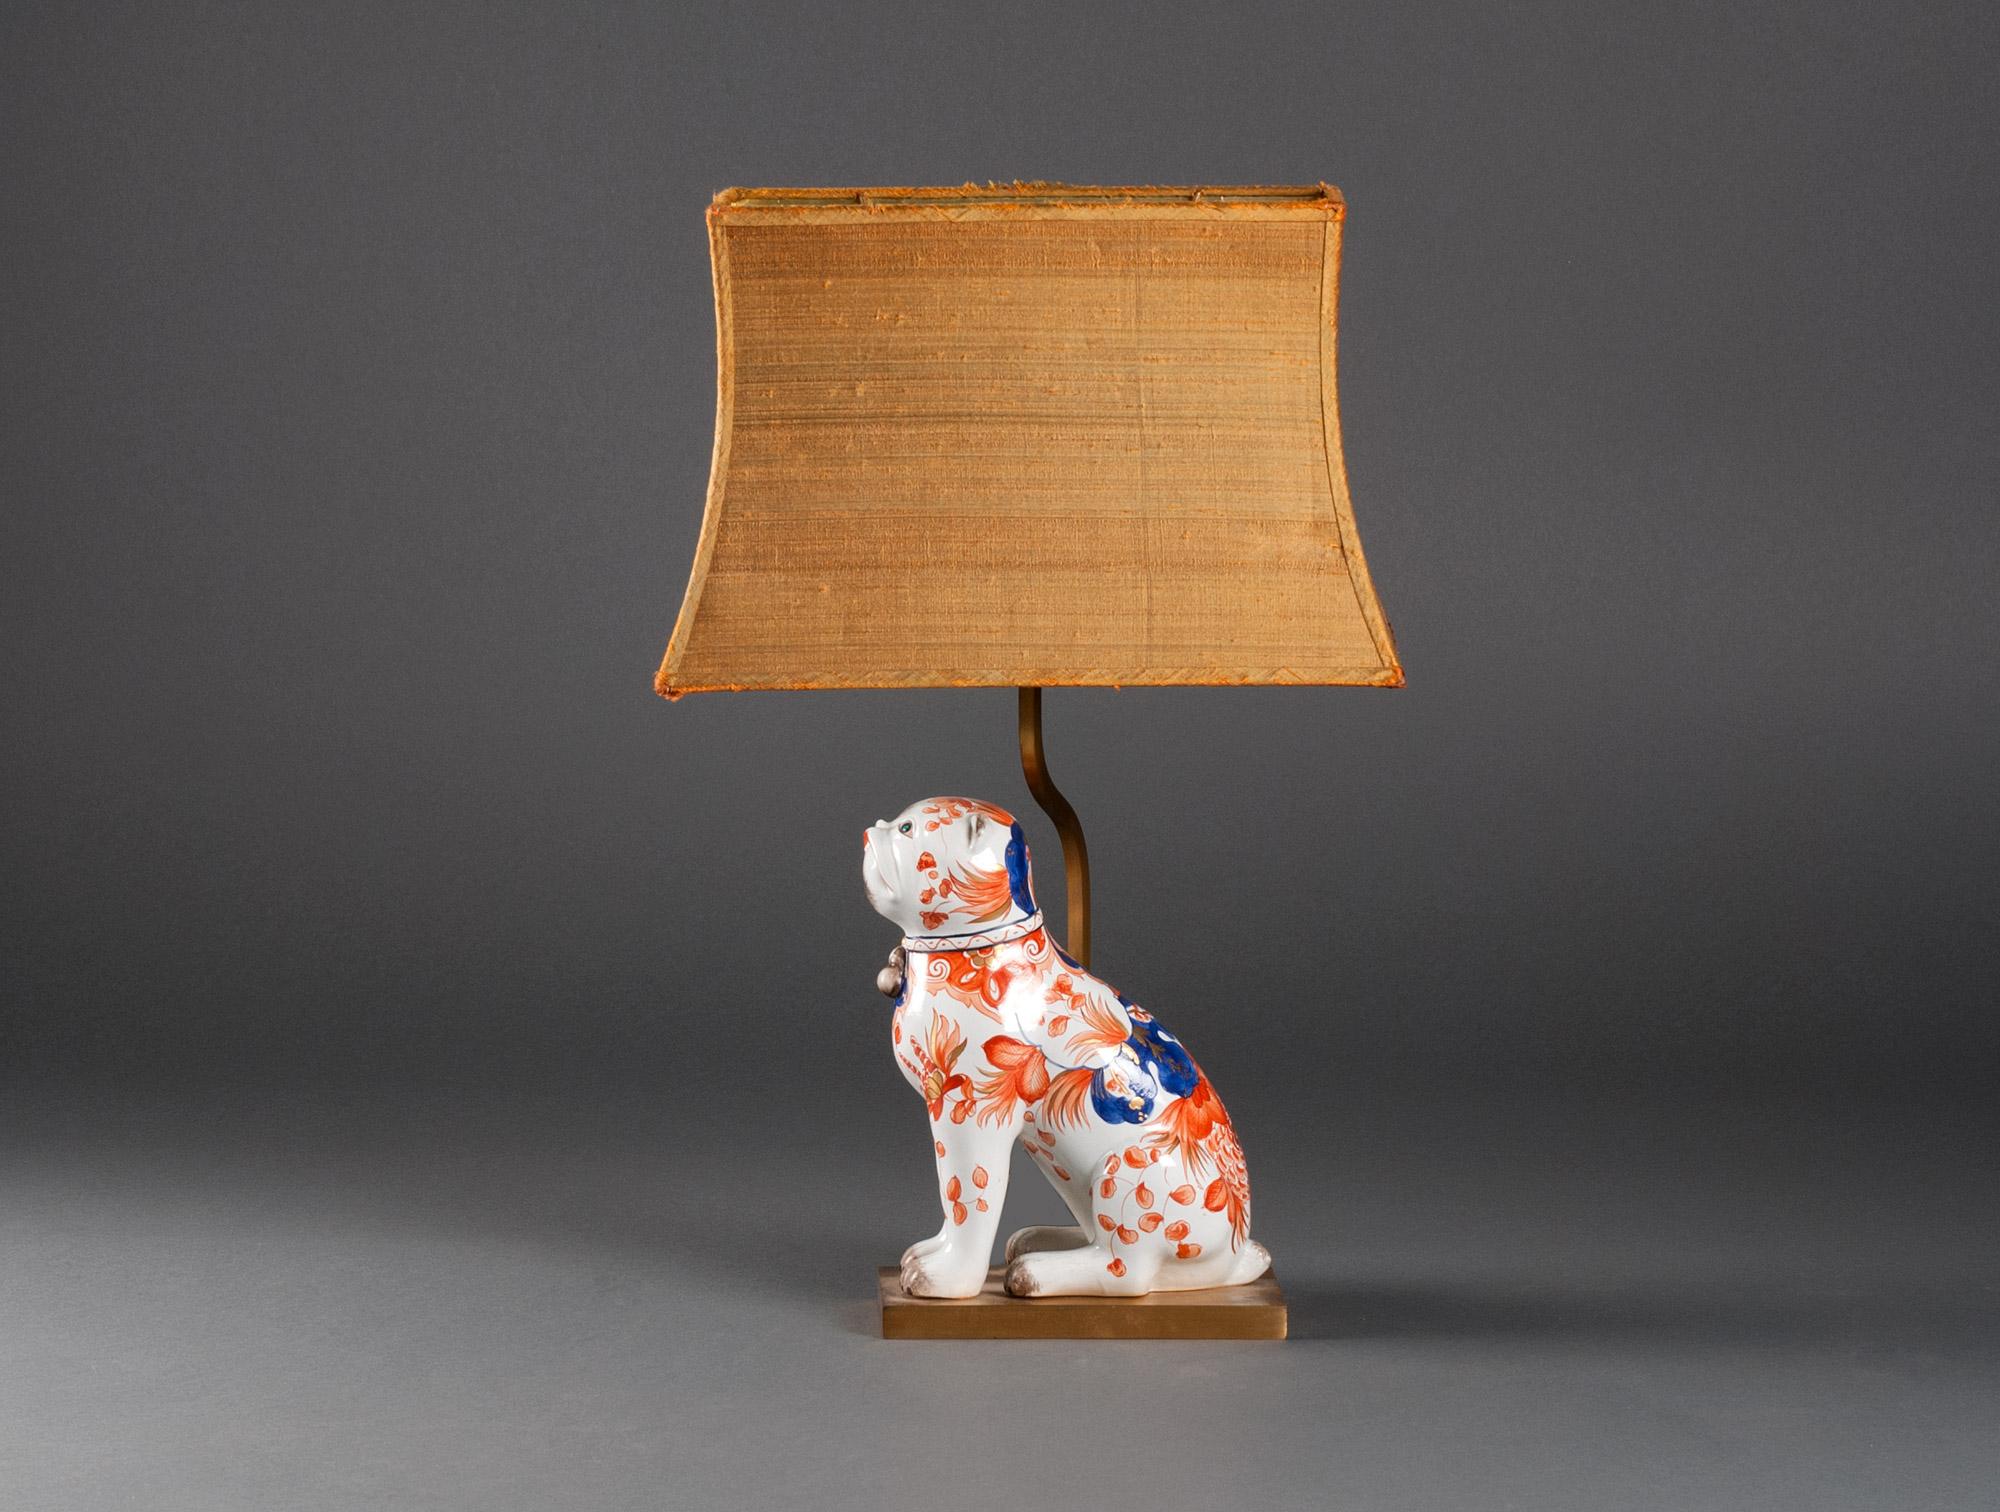 lampe carlin style asiatique soubrier louer luminaires lampe xxe. Black Bedroom Furniture Sets. Home Design Ideas